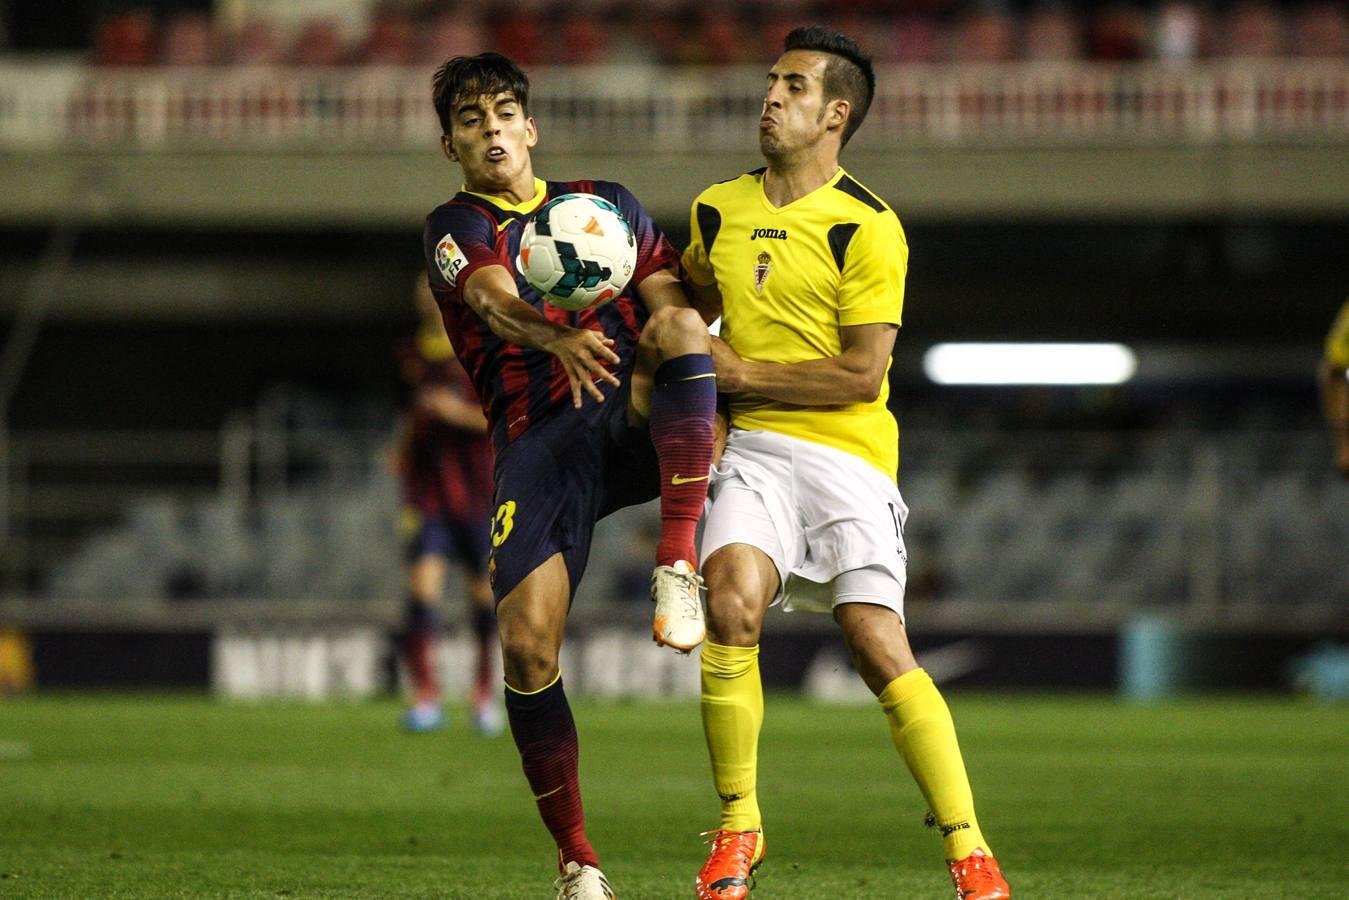 El Barcelona B golea al Murcia (4-0)